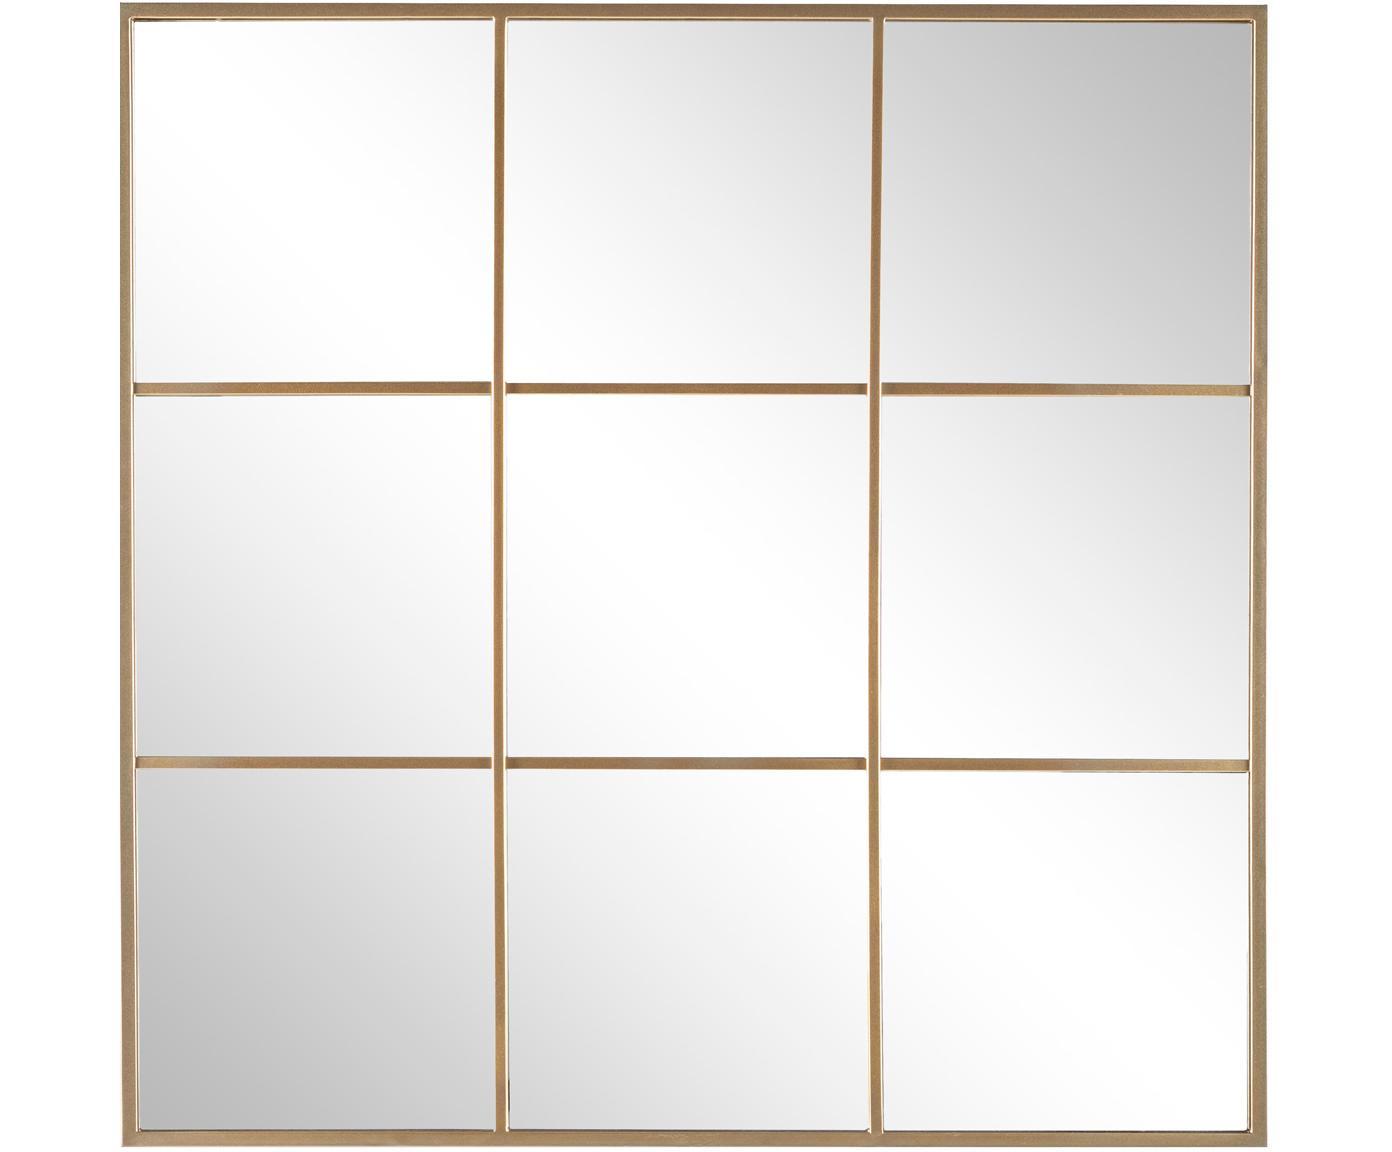 Espejo de pared Nucleos, marco de metal, Espejo: cristal, Dorado, An 90 x Al 90 cm